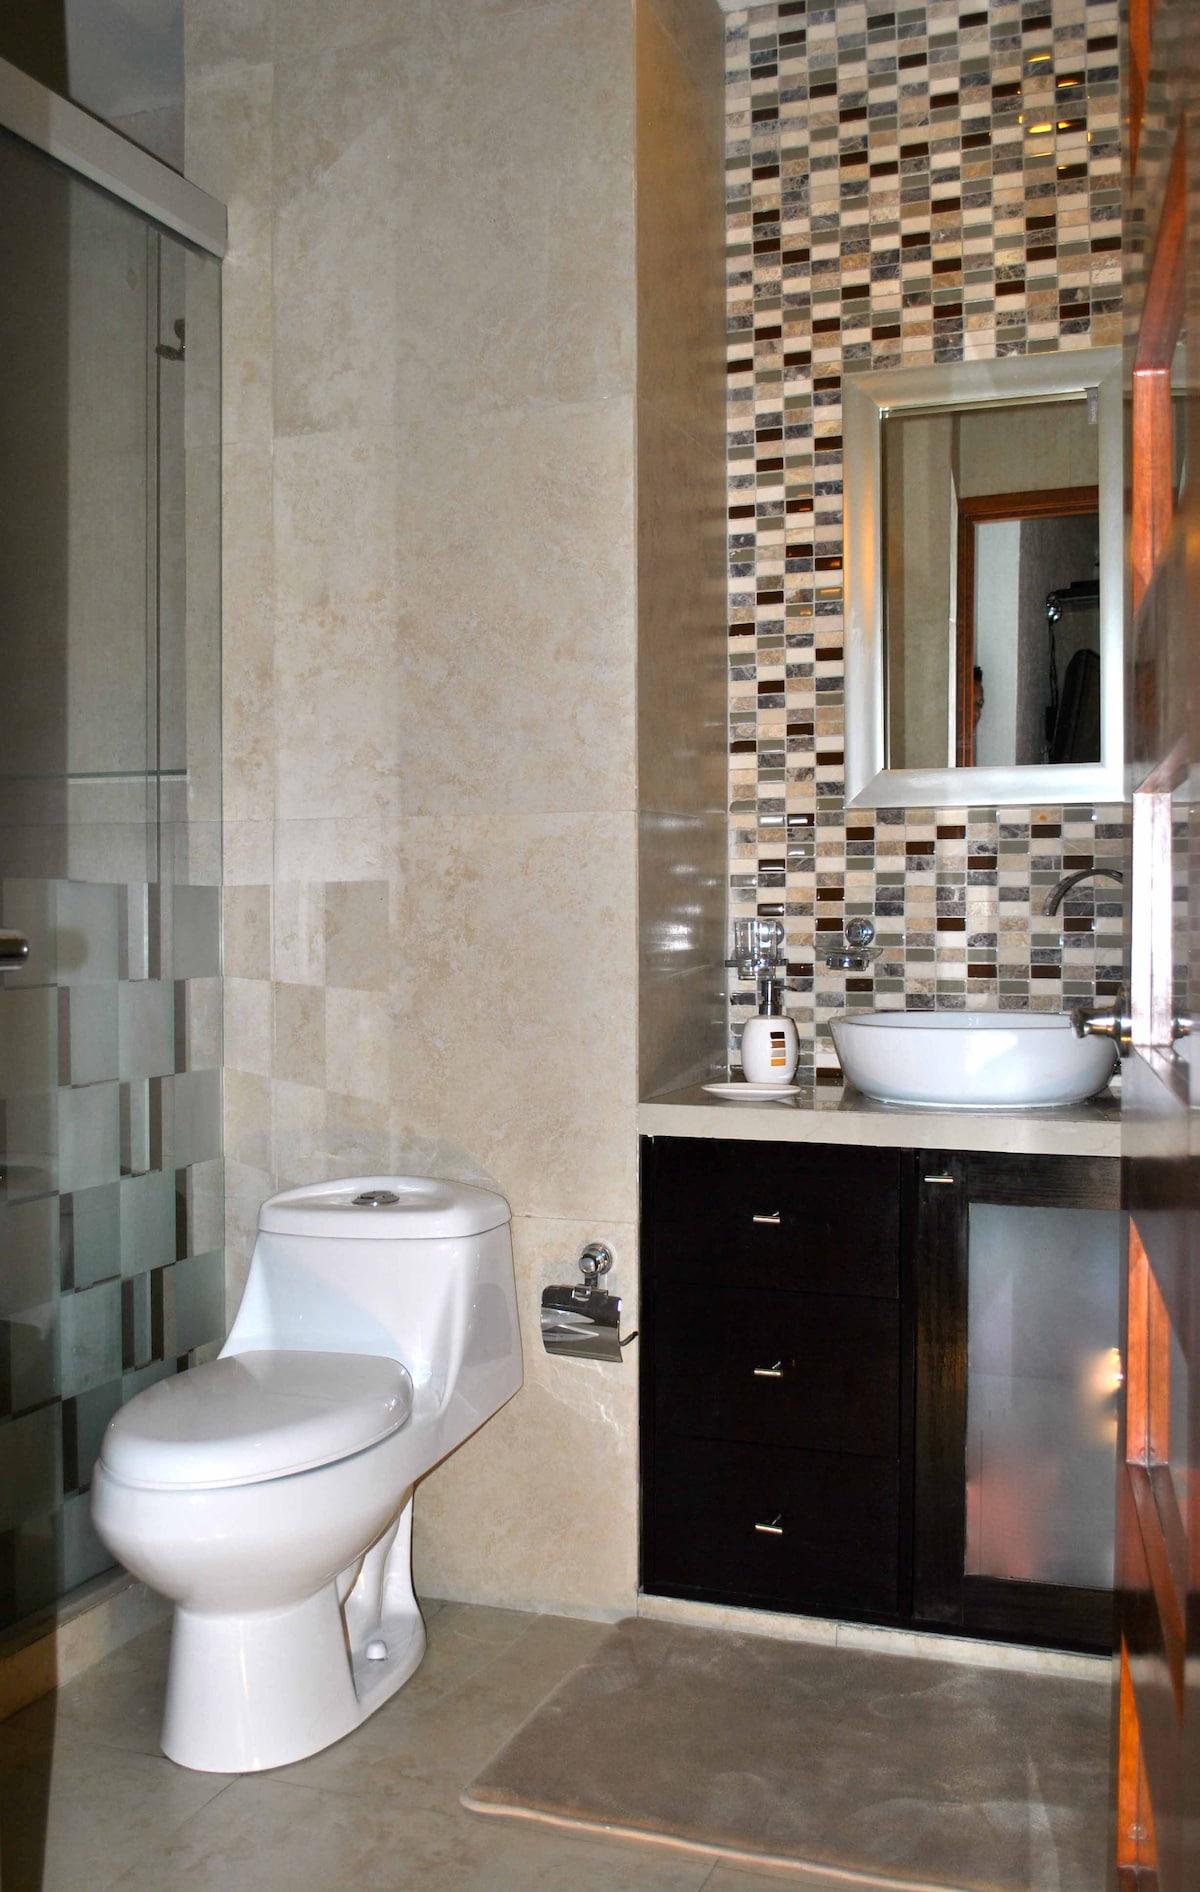 Nice, comfortable bathroom